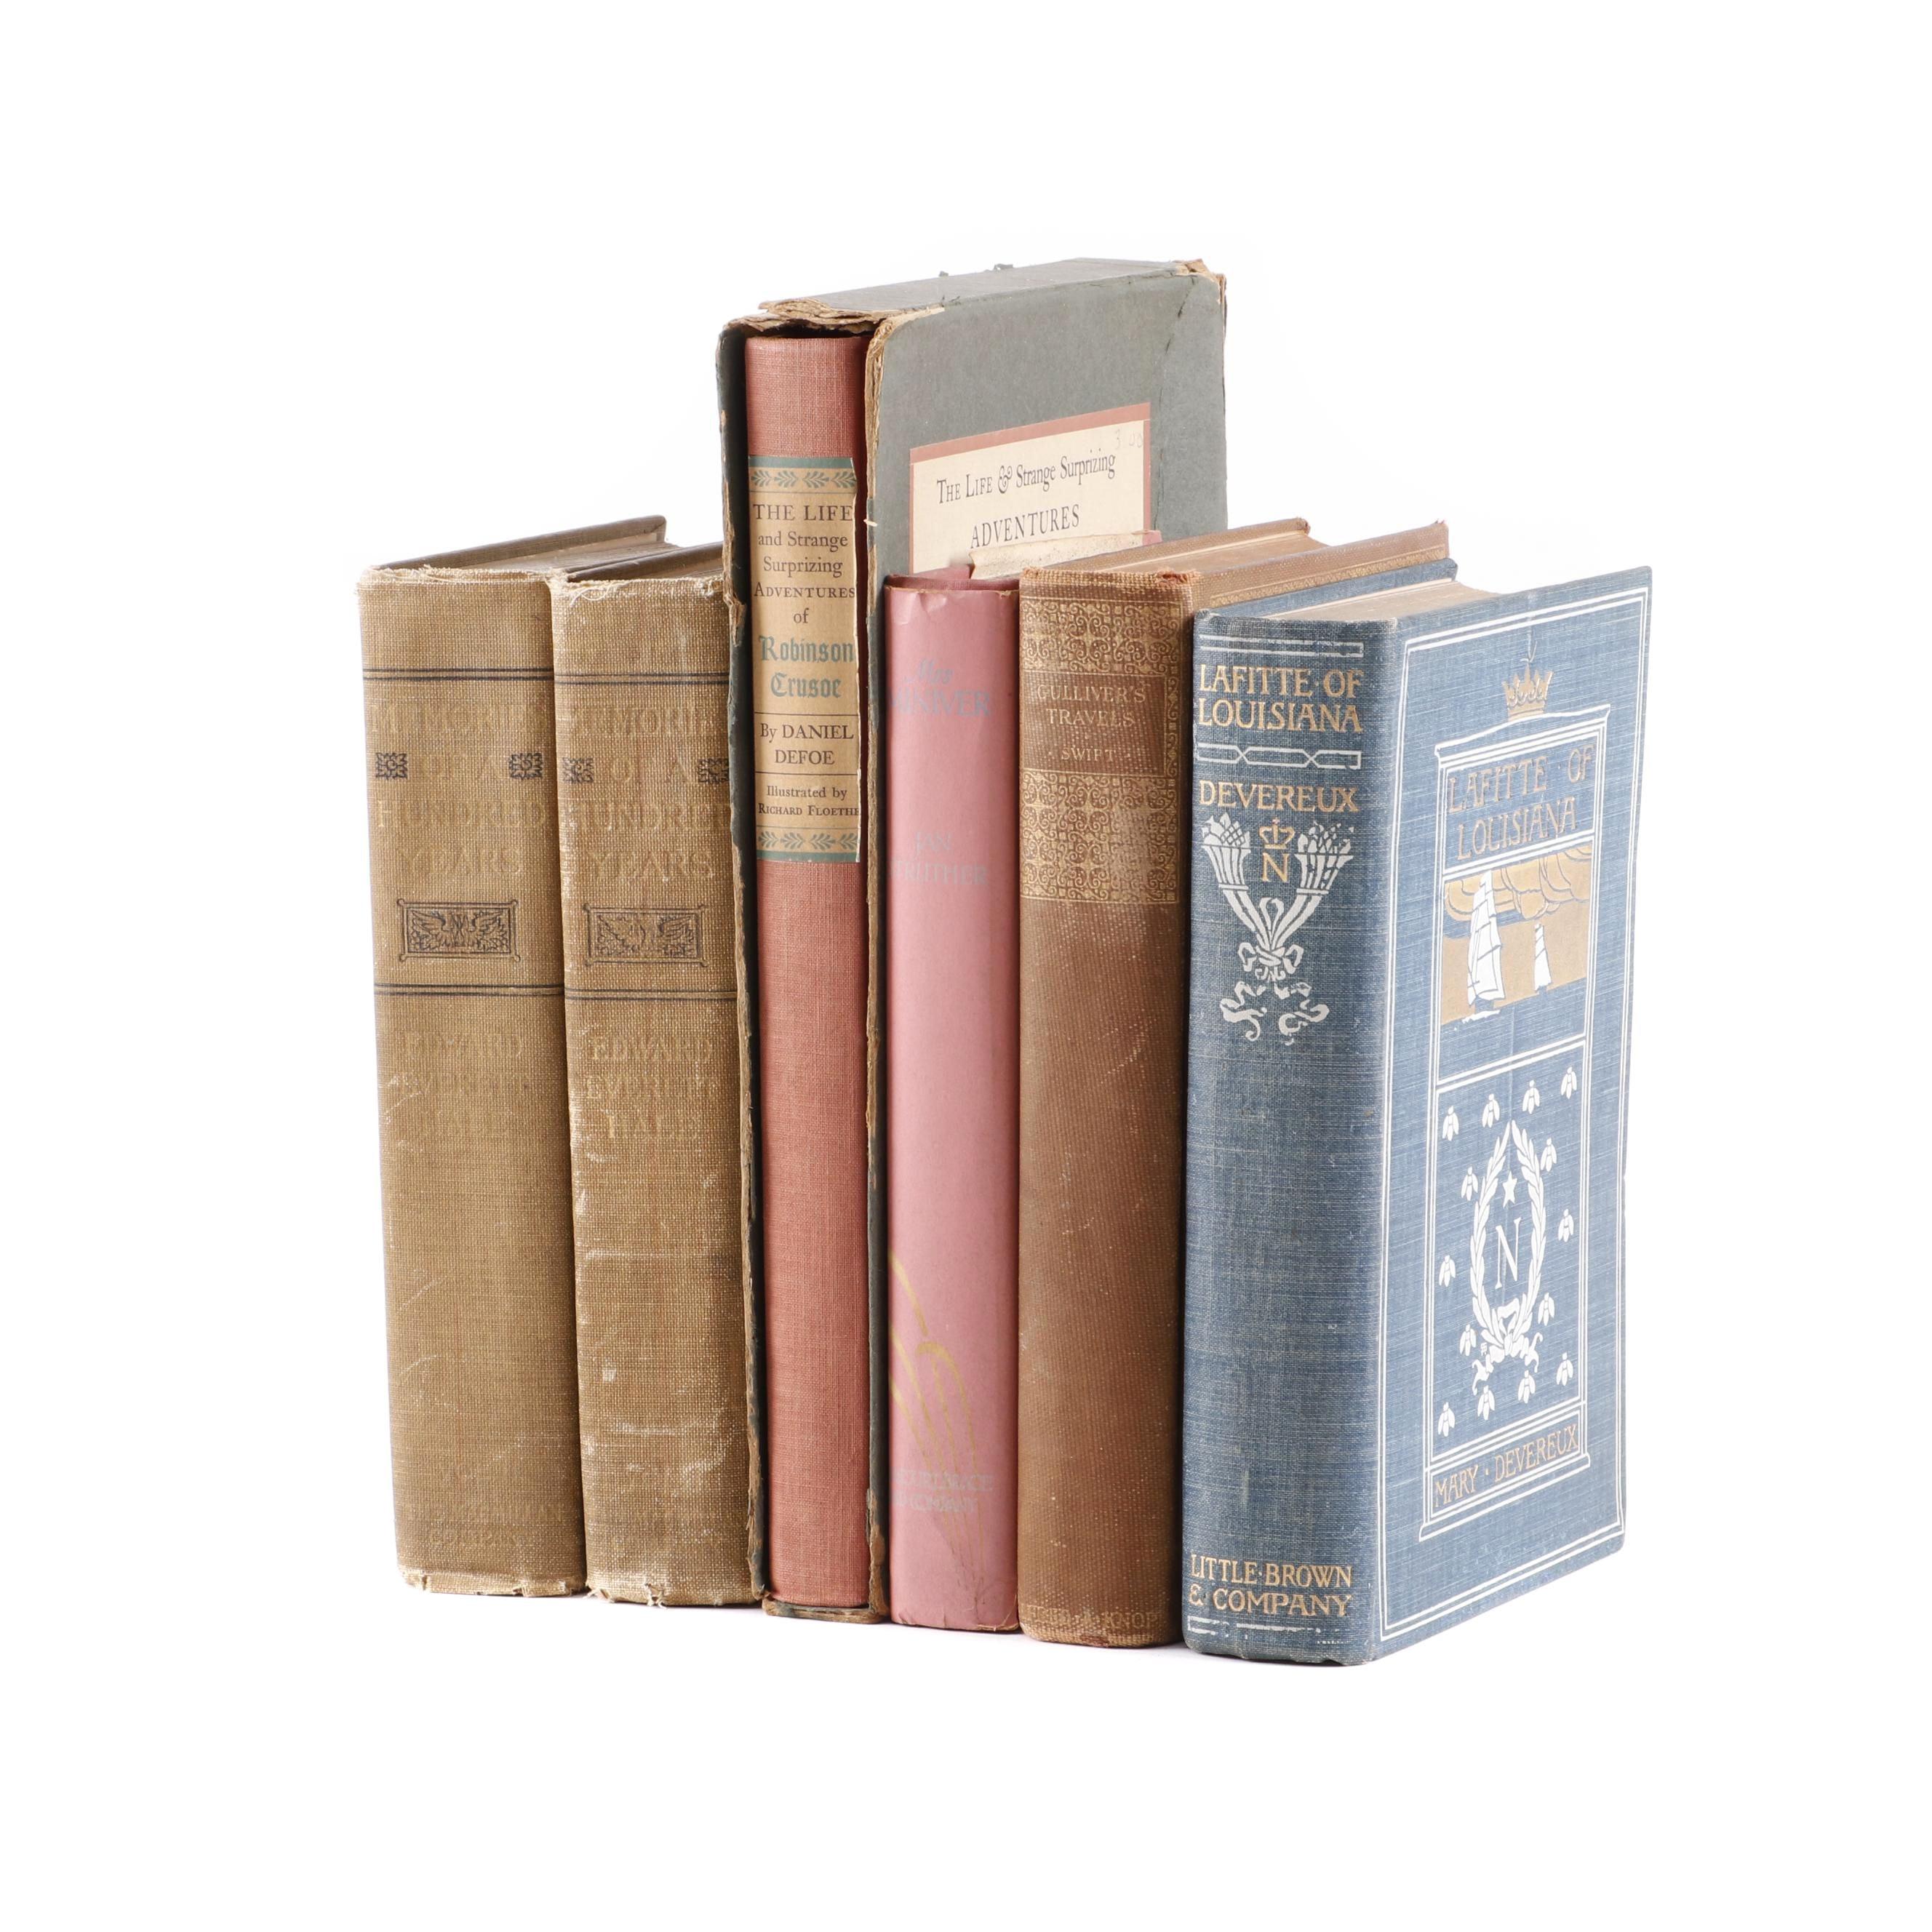 Vintage and Antique Children's Books